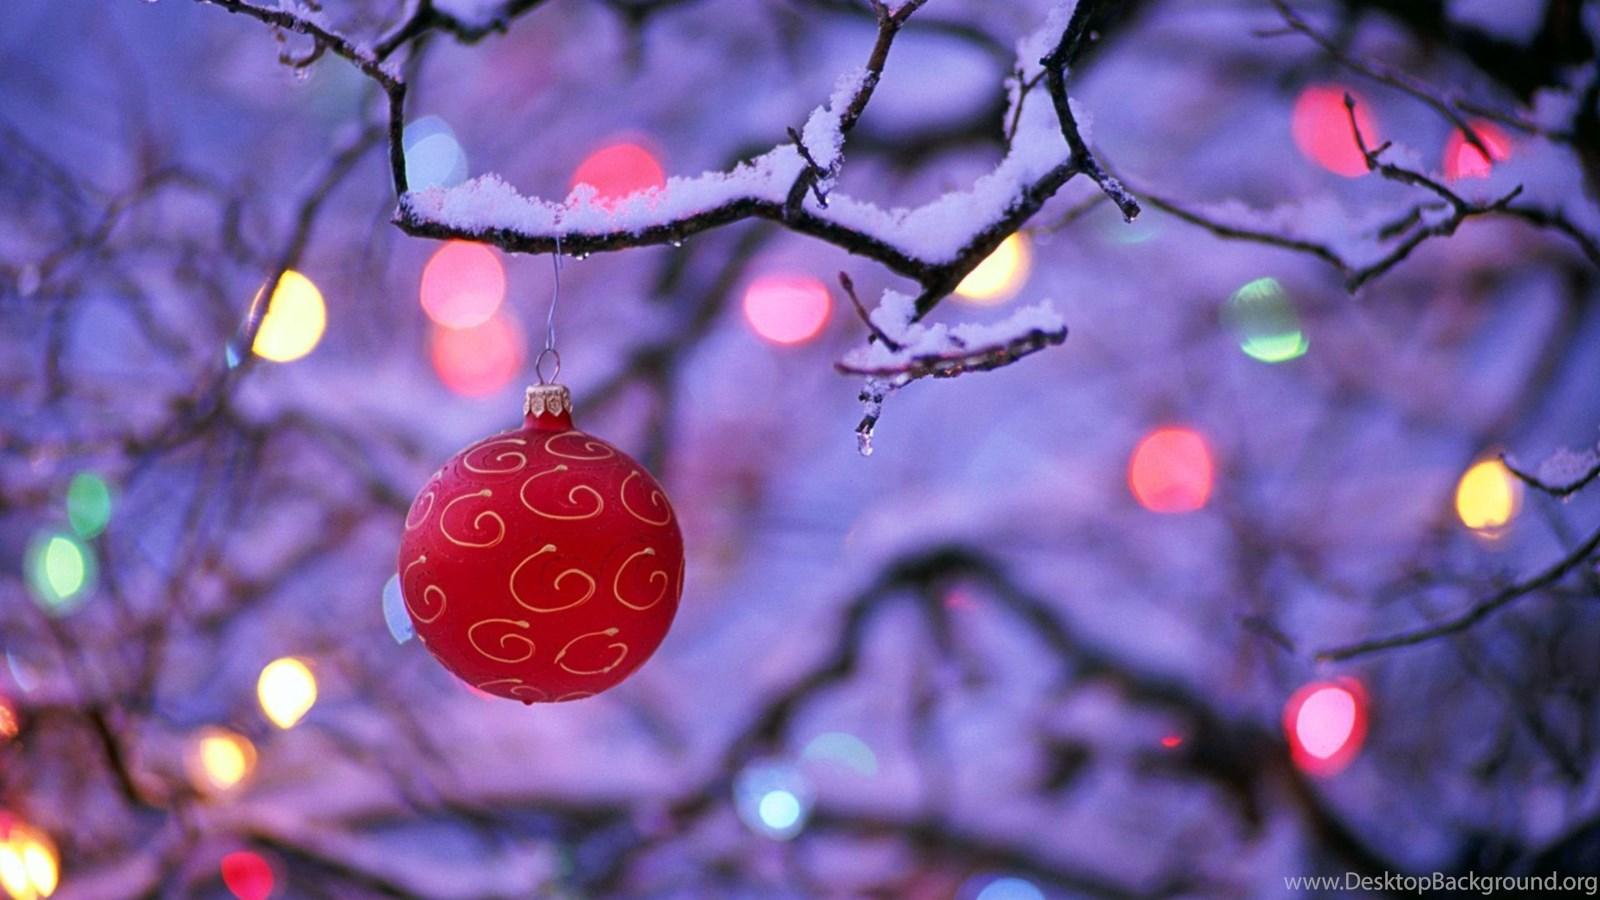 christmas desktop wallpaper_hd wallpaper_download free wallpapers